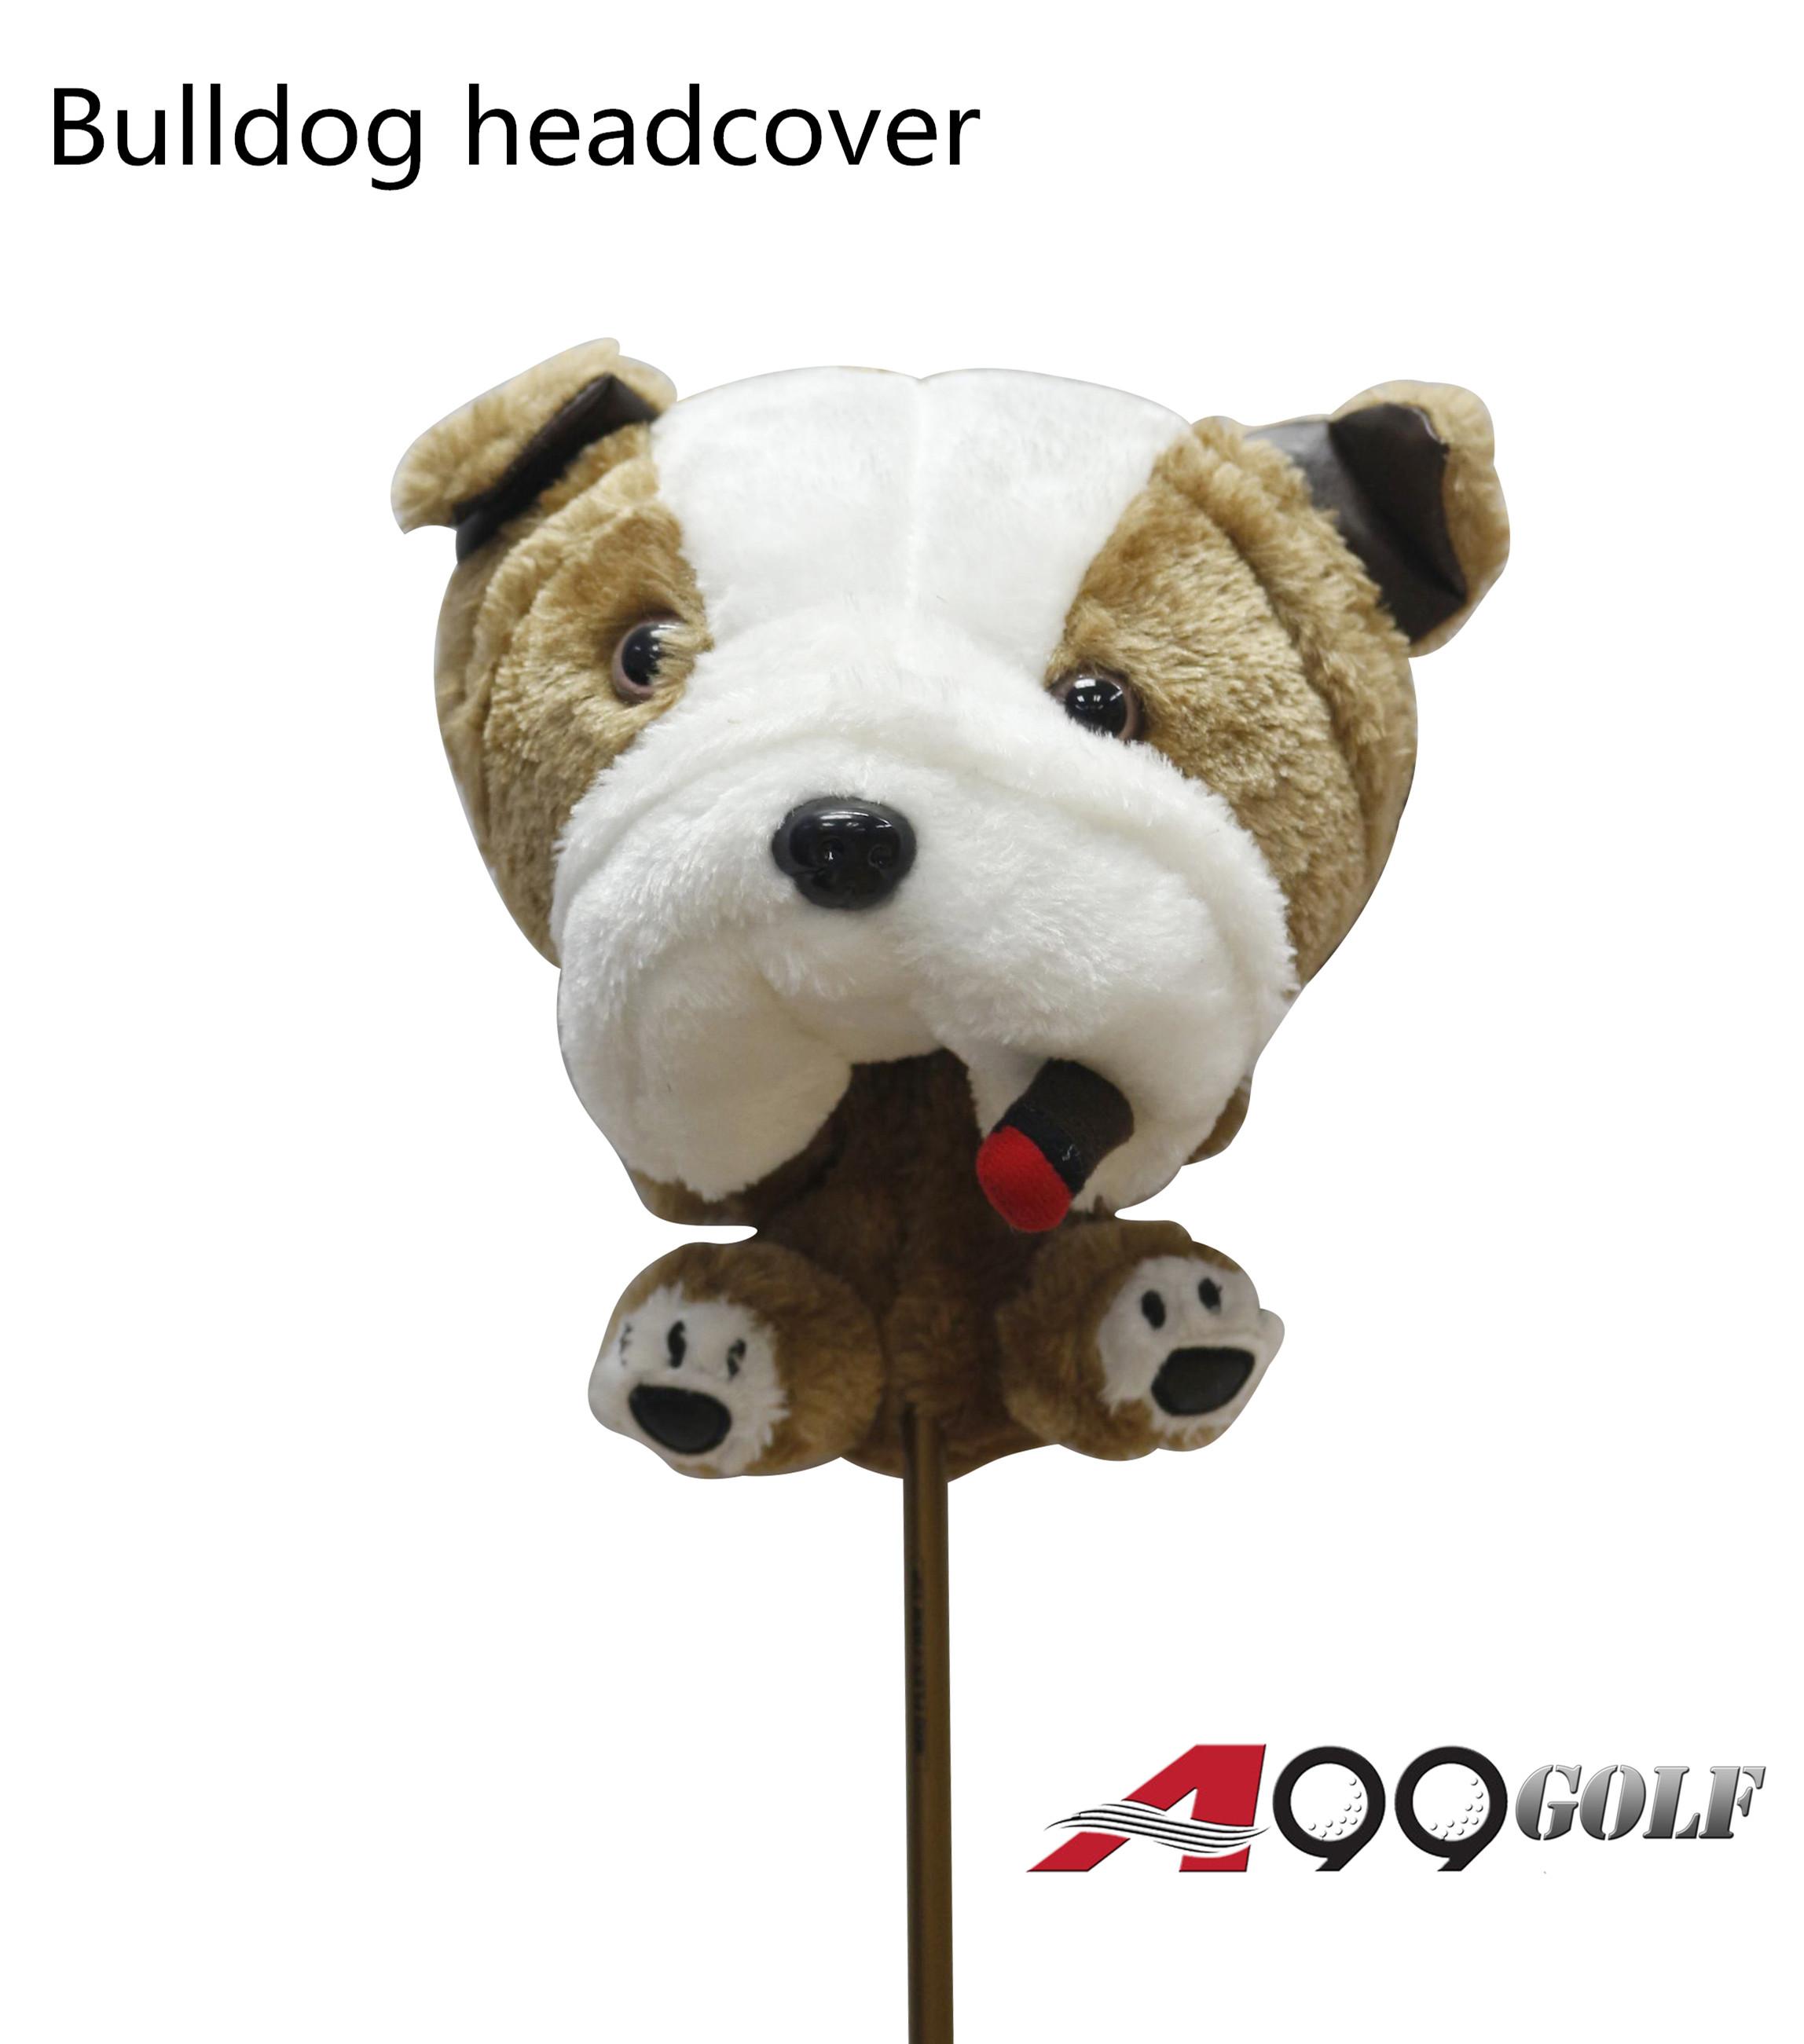 Bulldog head cover